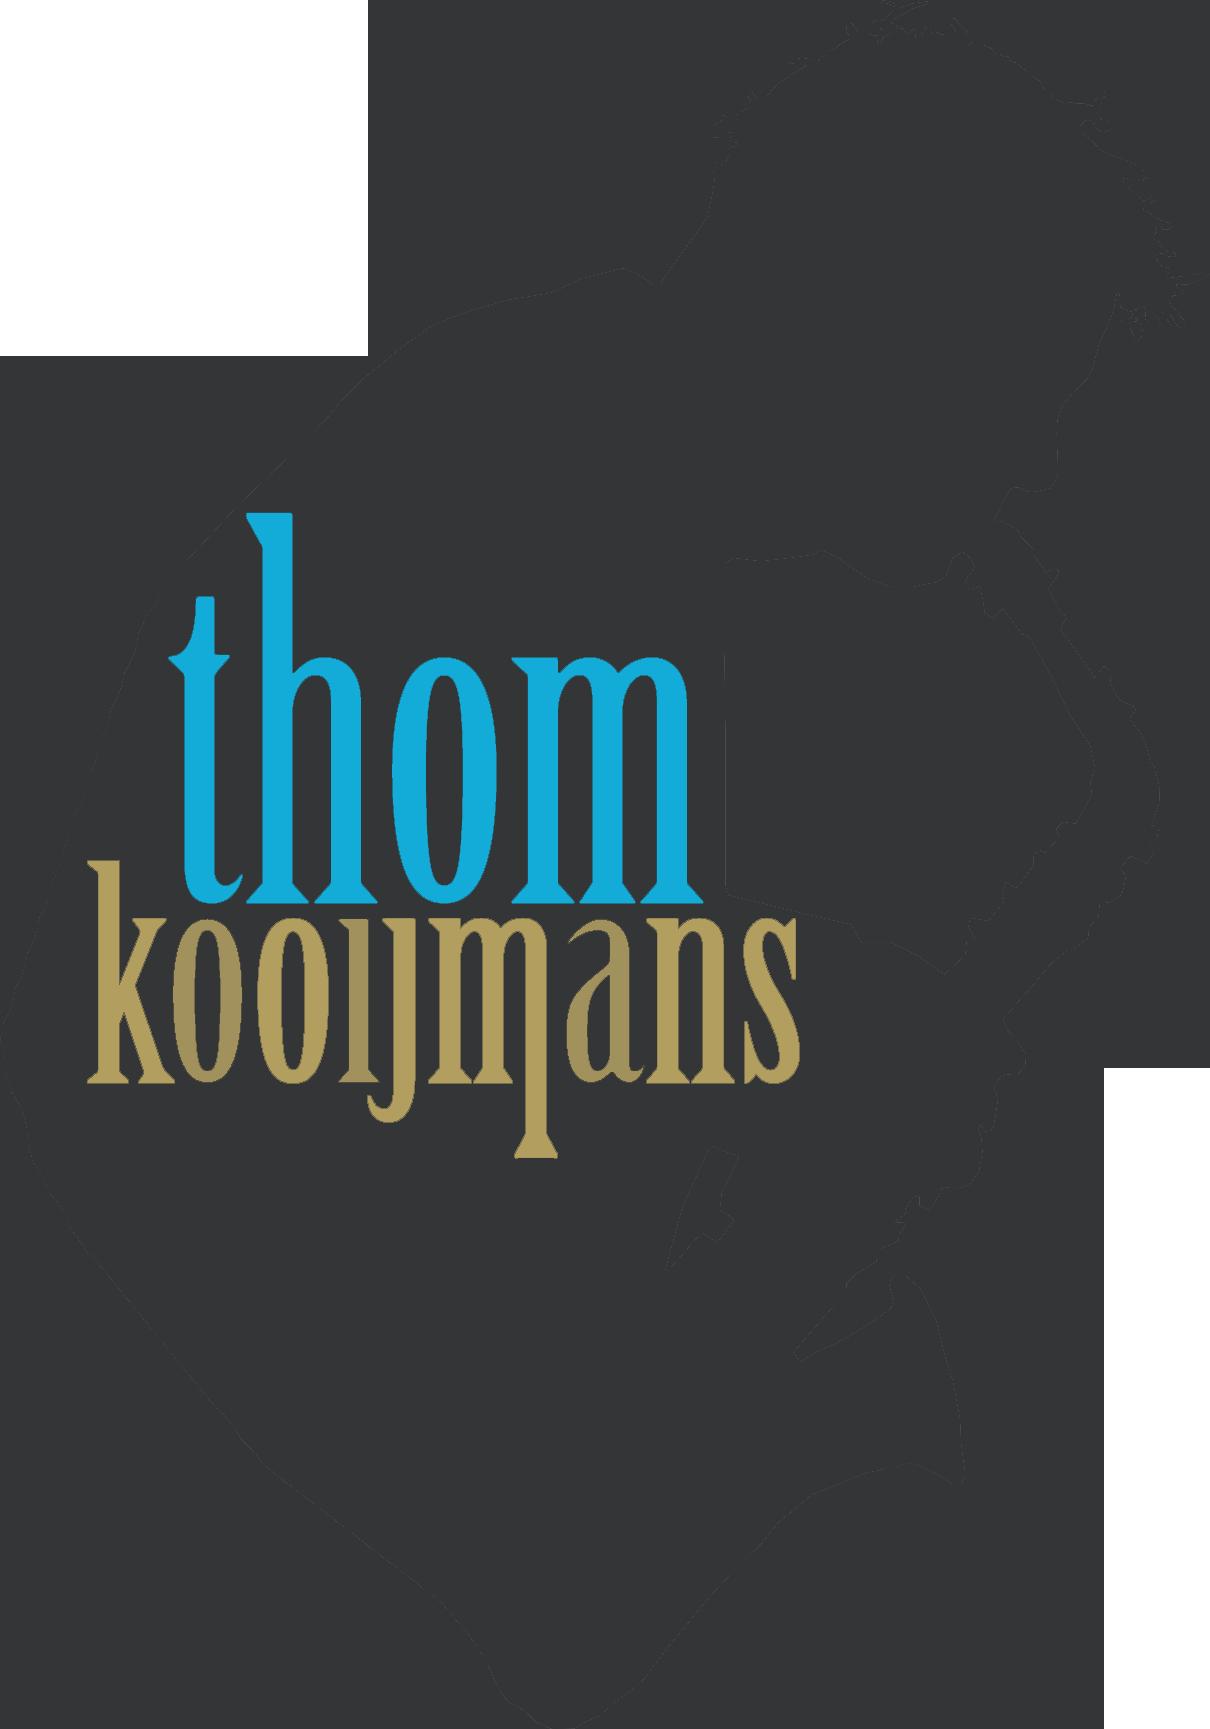 Thom Kooijmans